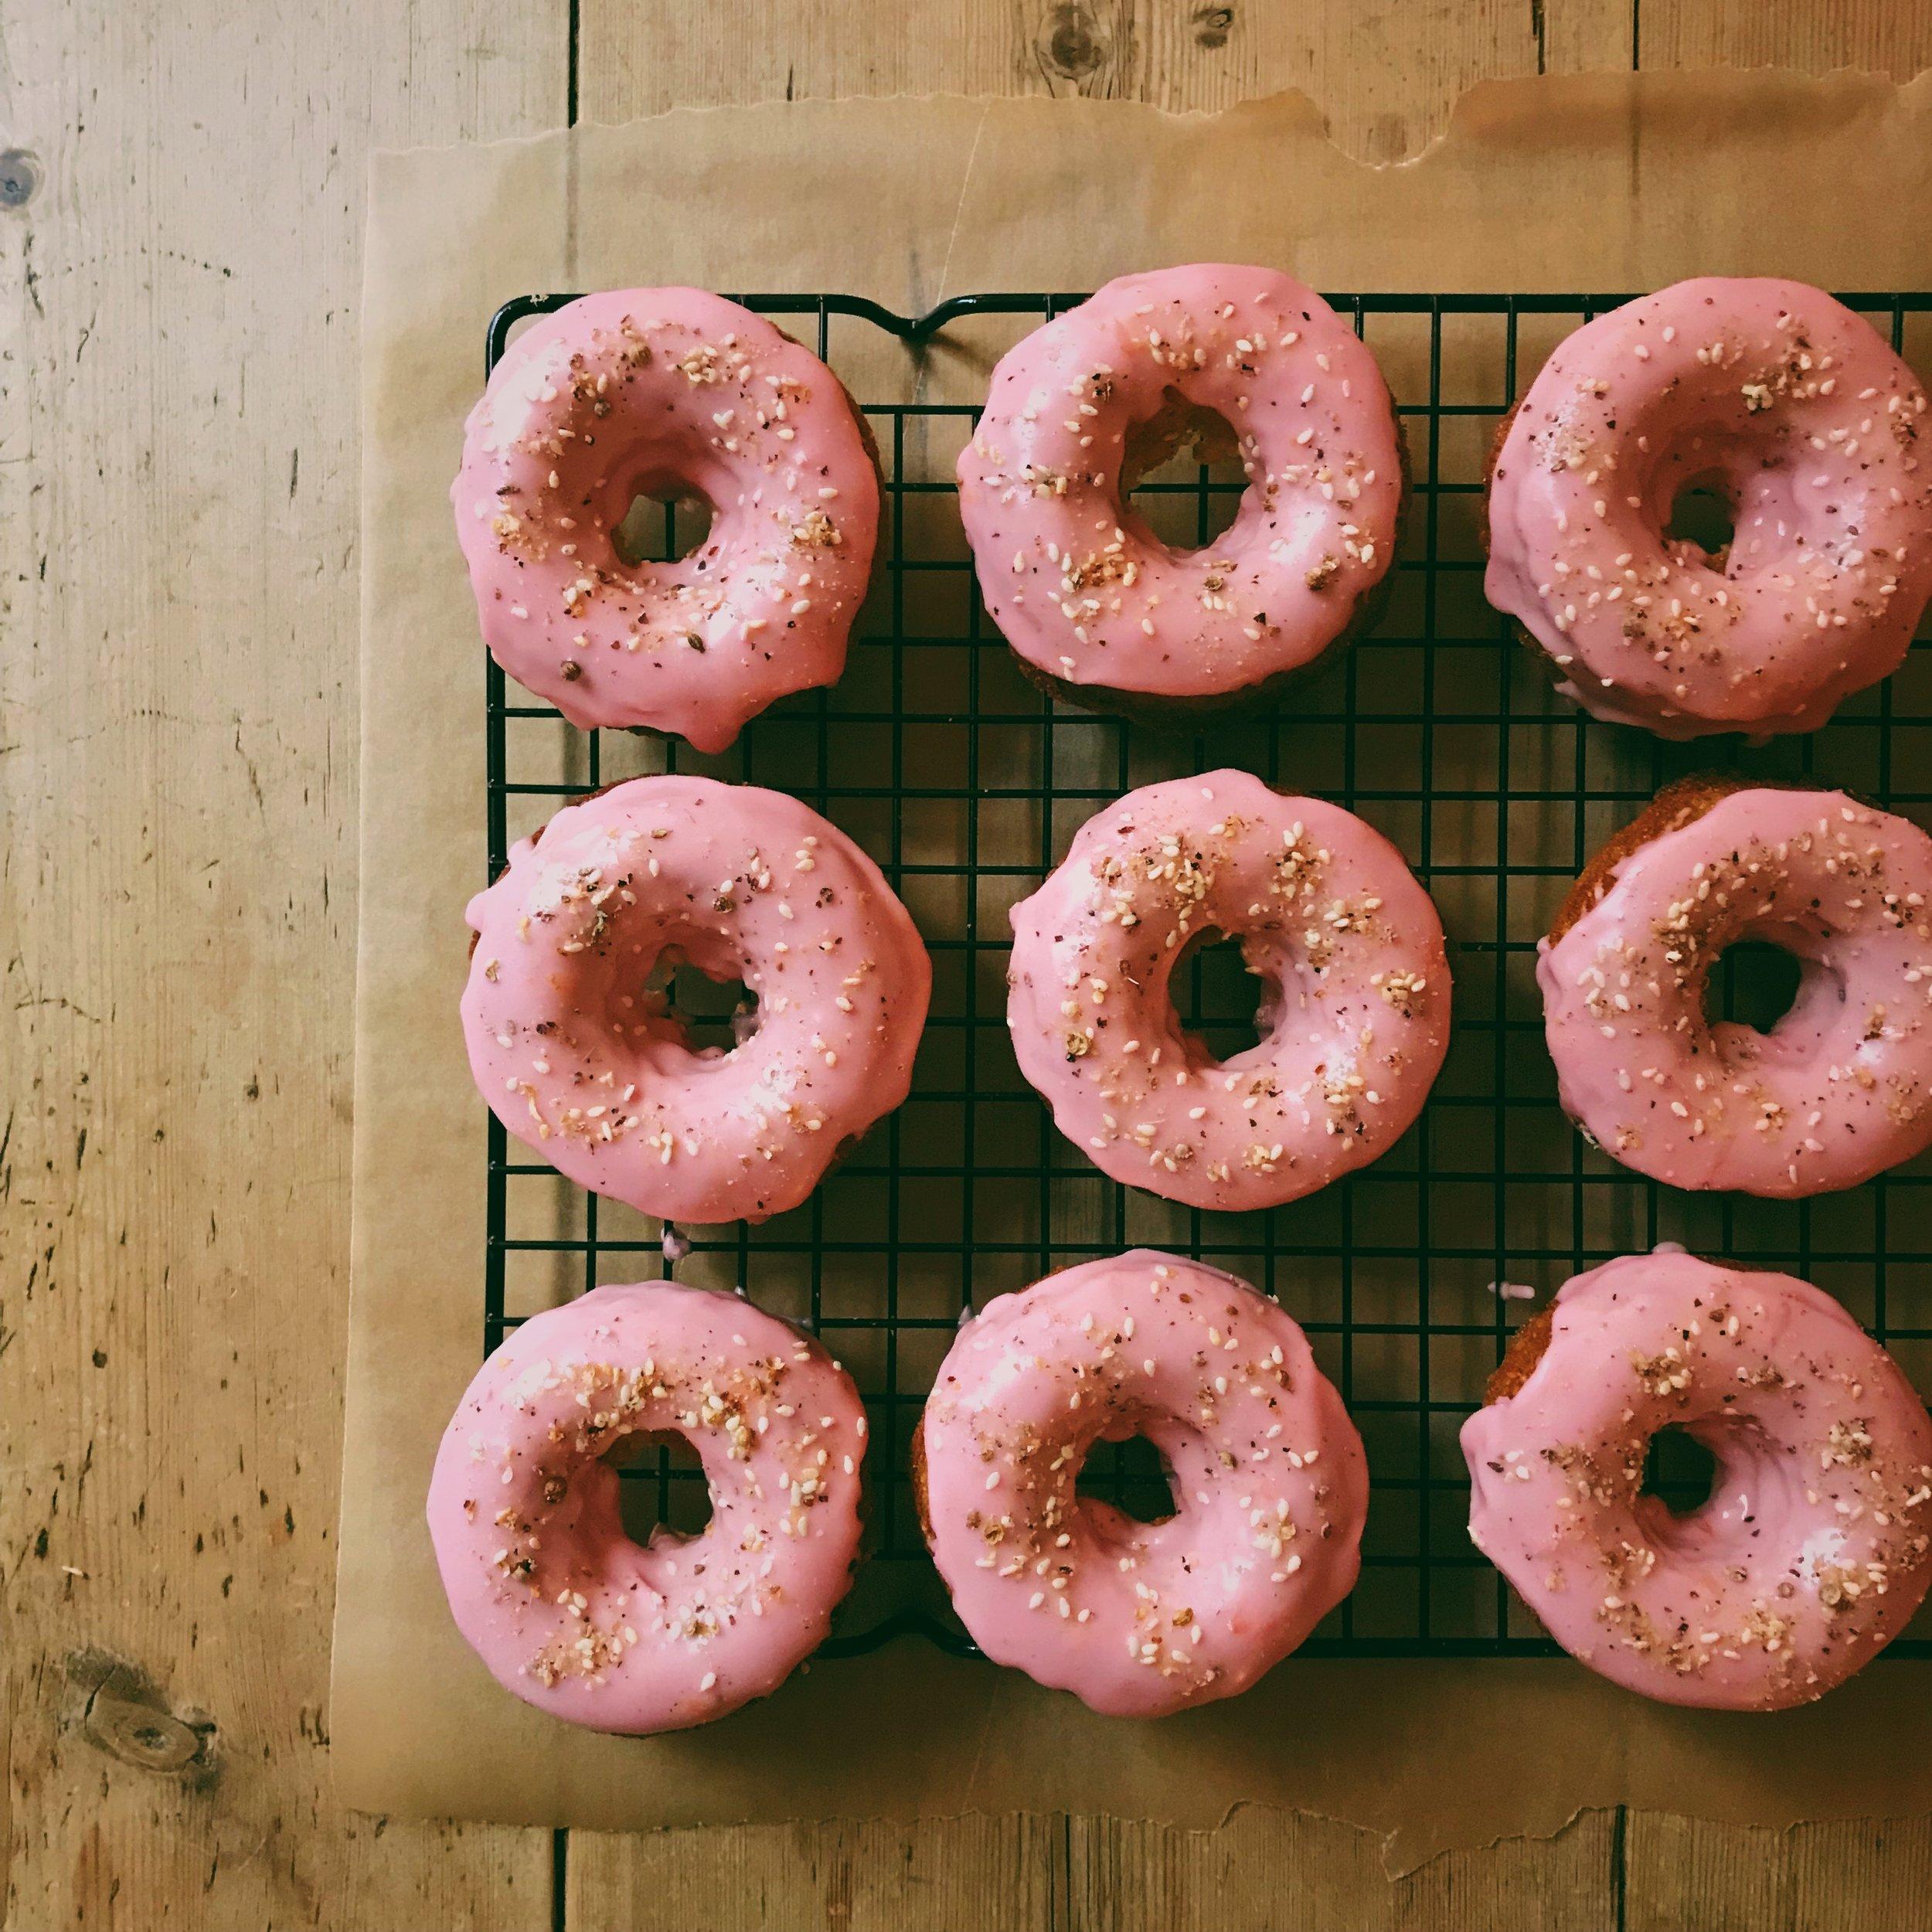 Dukkah Donuts with Blood Orange Glaze